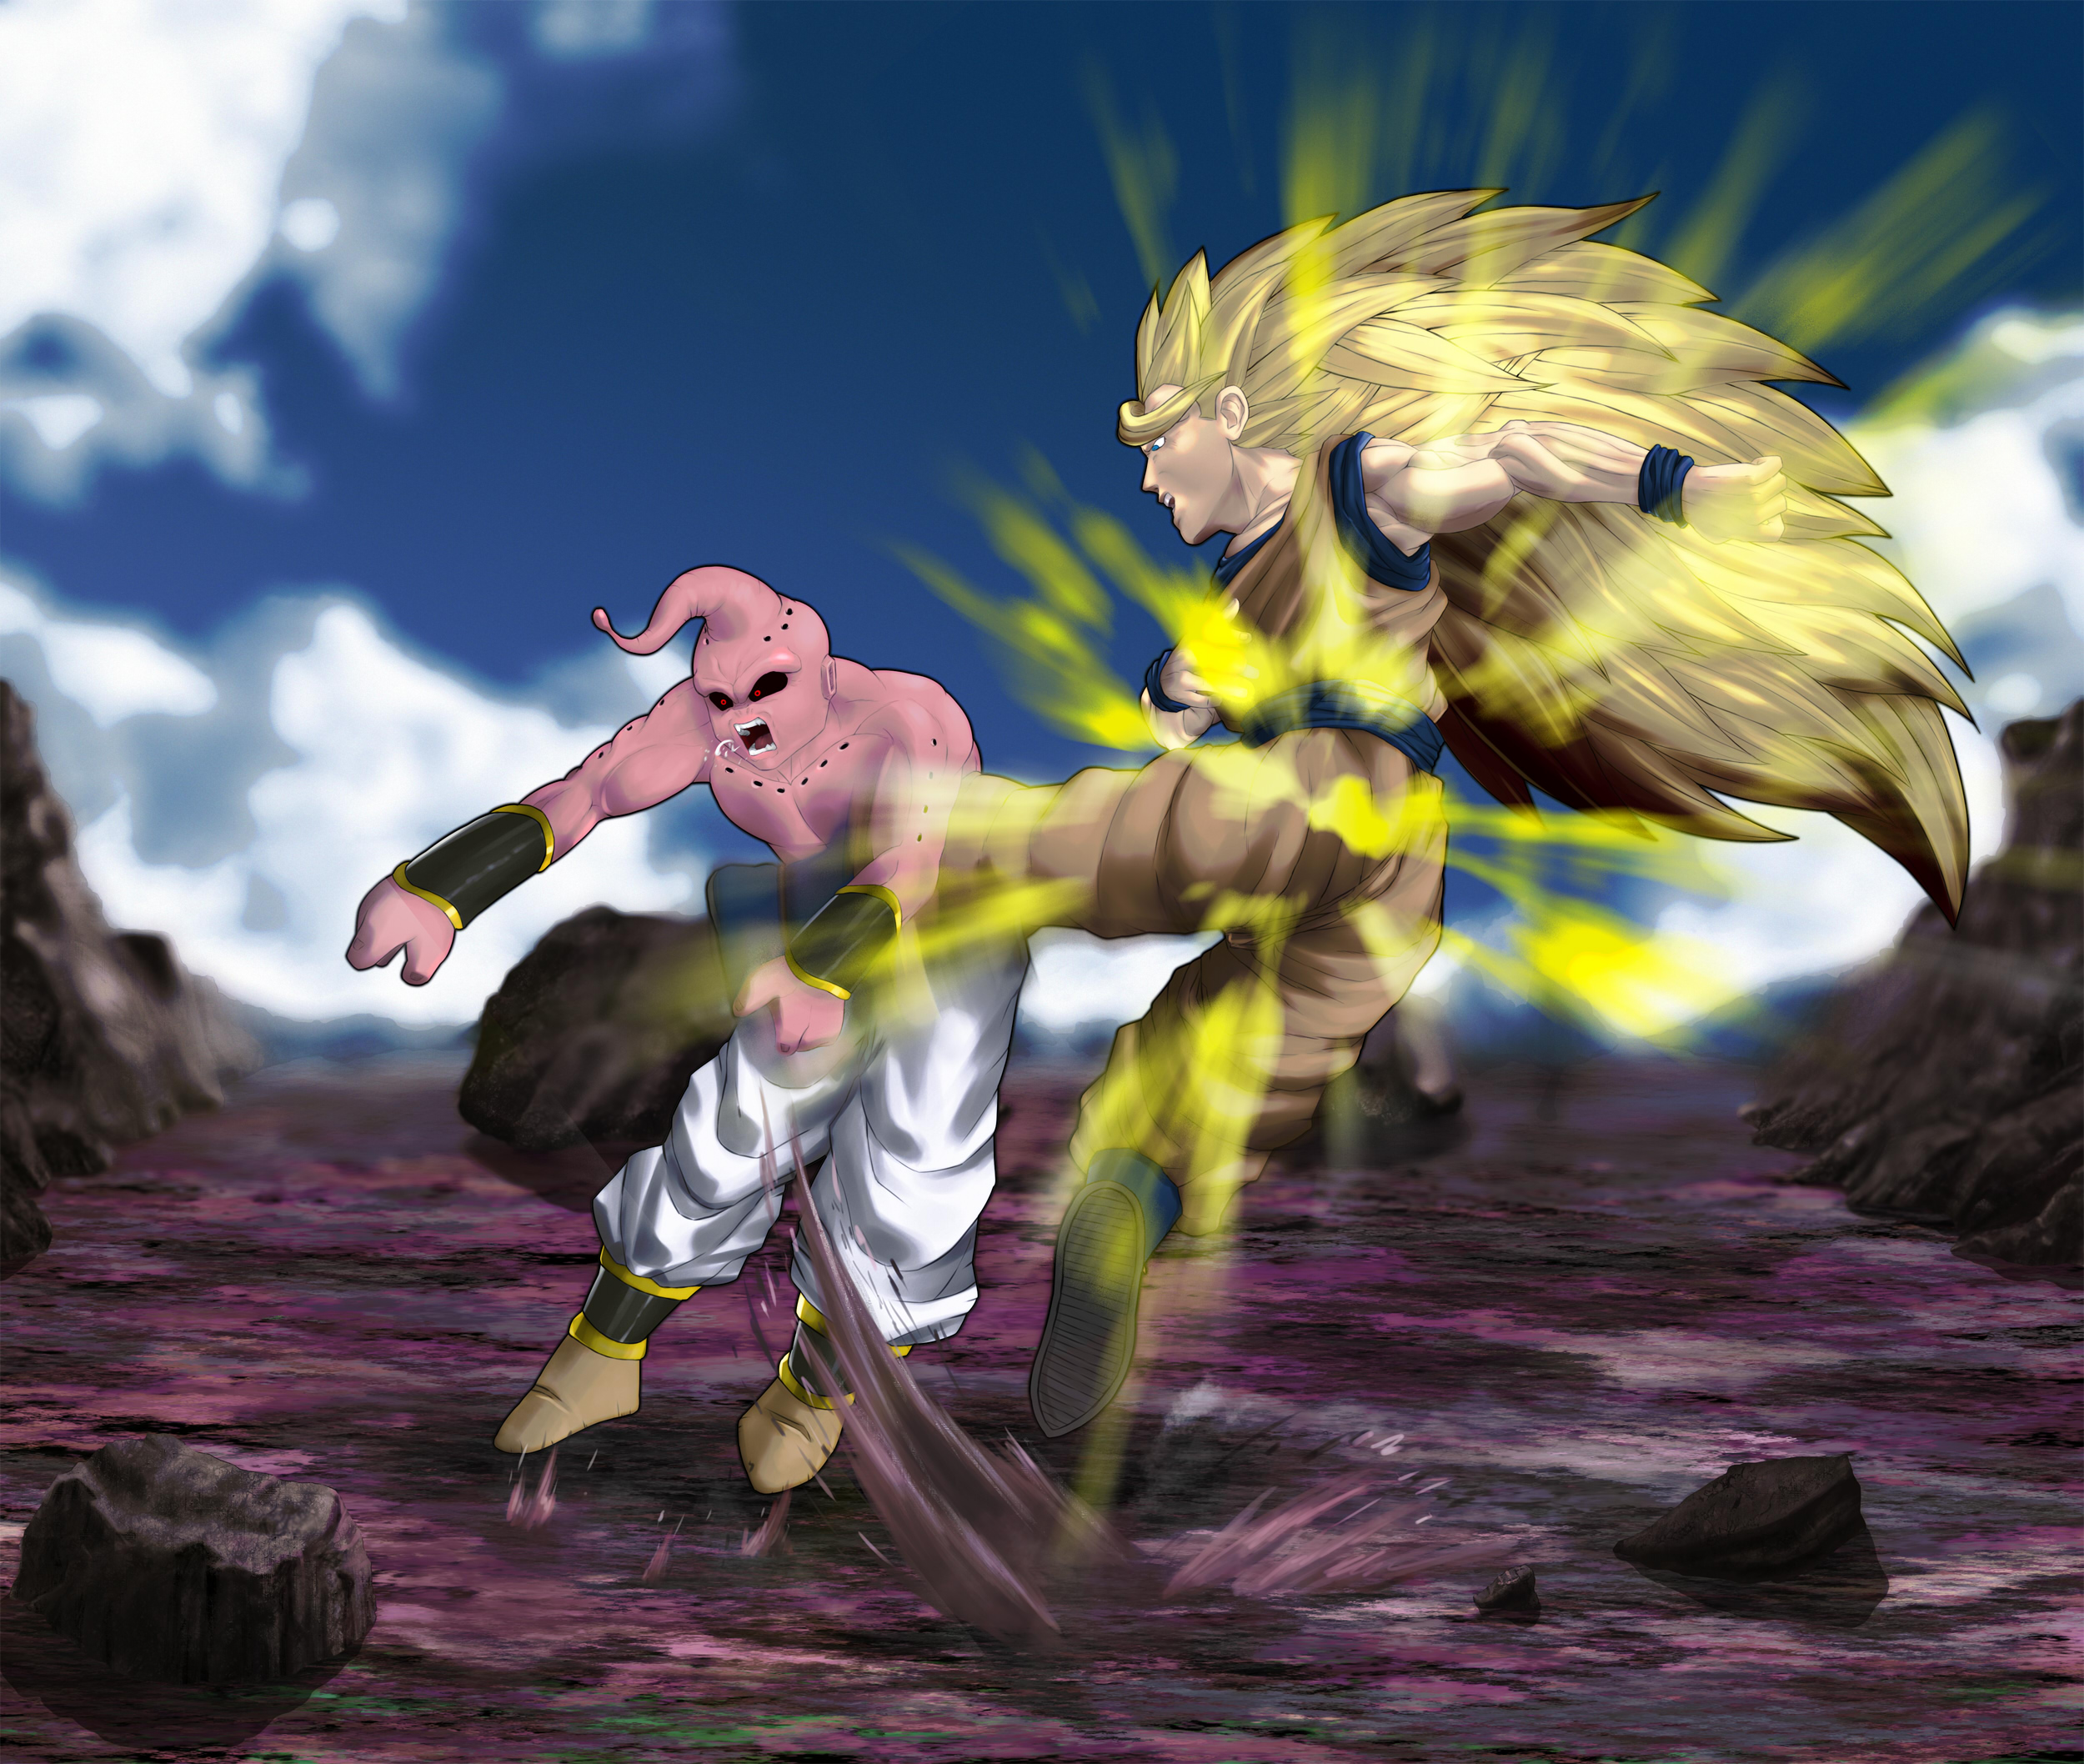 Majin Buu Wallpaper: Goku Vs Buu Full HD Wallpaper And Background Image